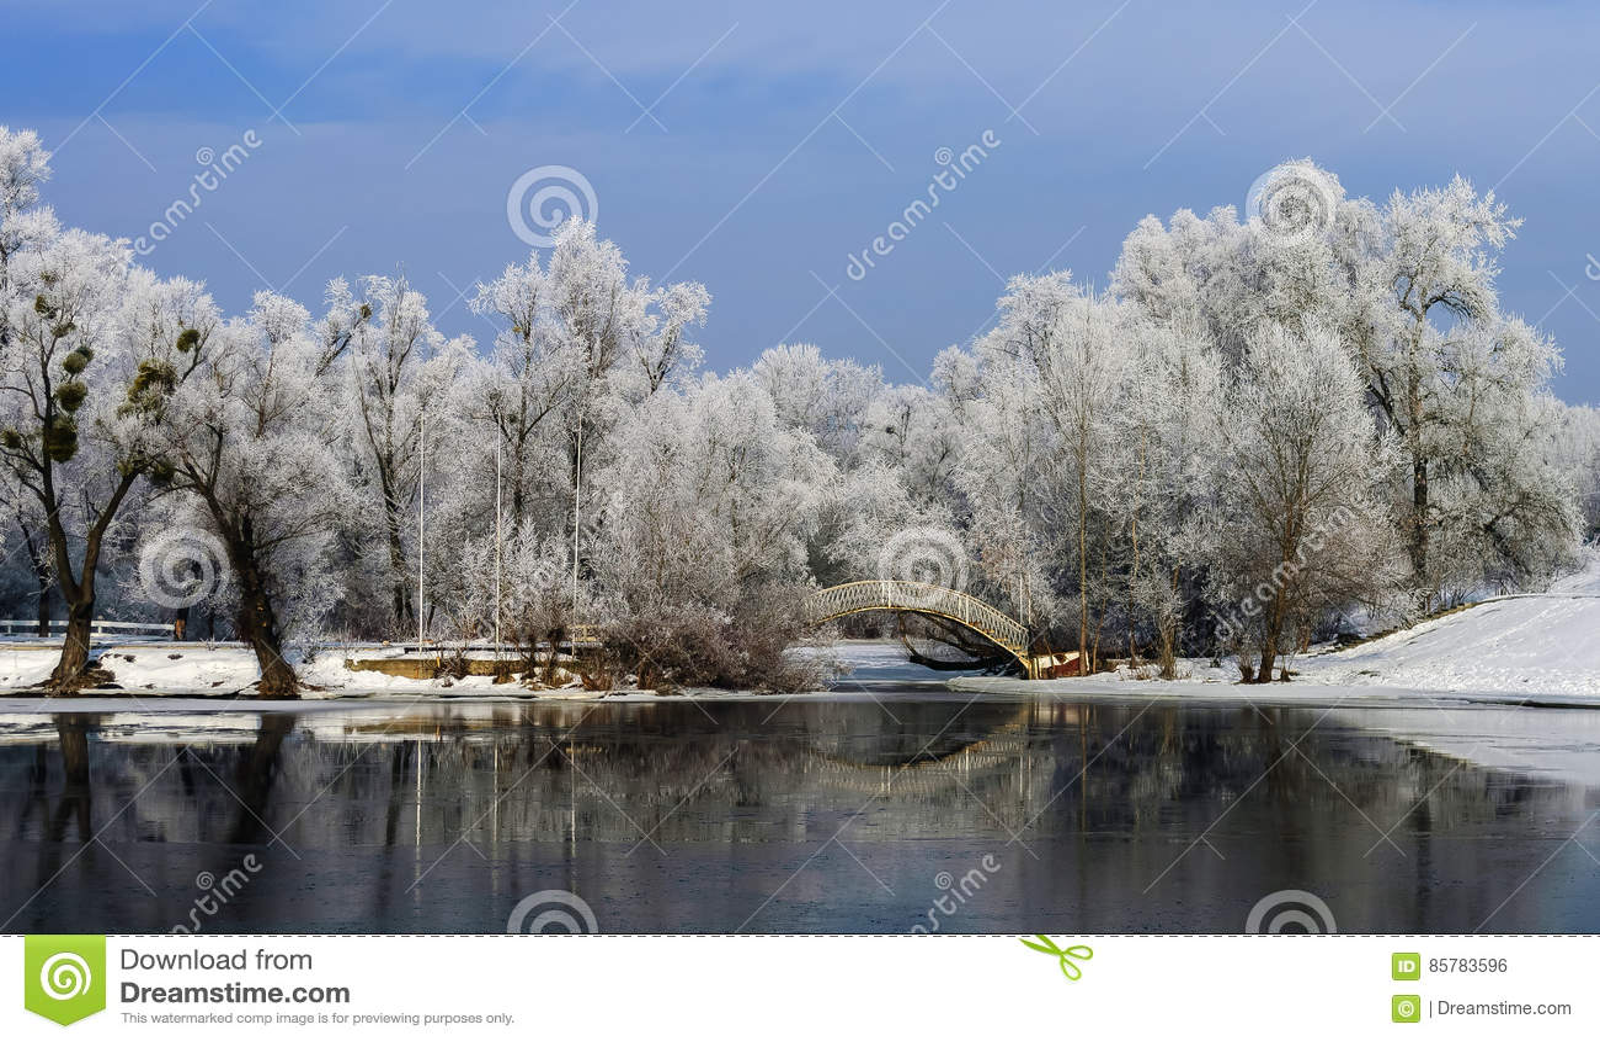 Мост горба над заливом реки среди больших деревьев в заморозке